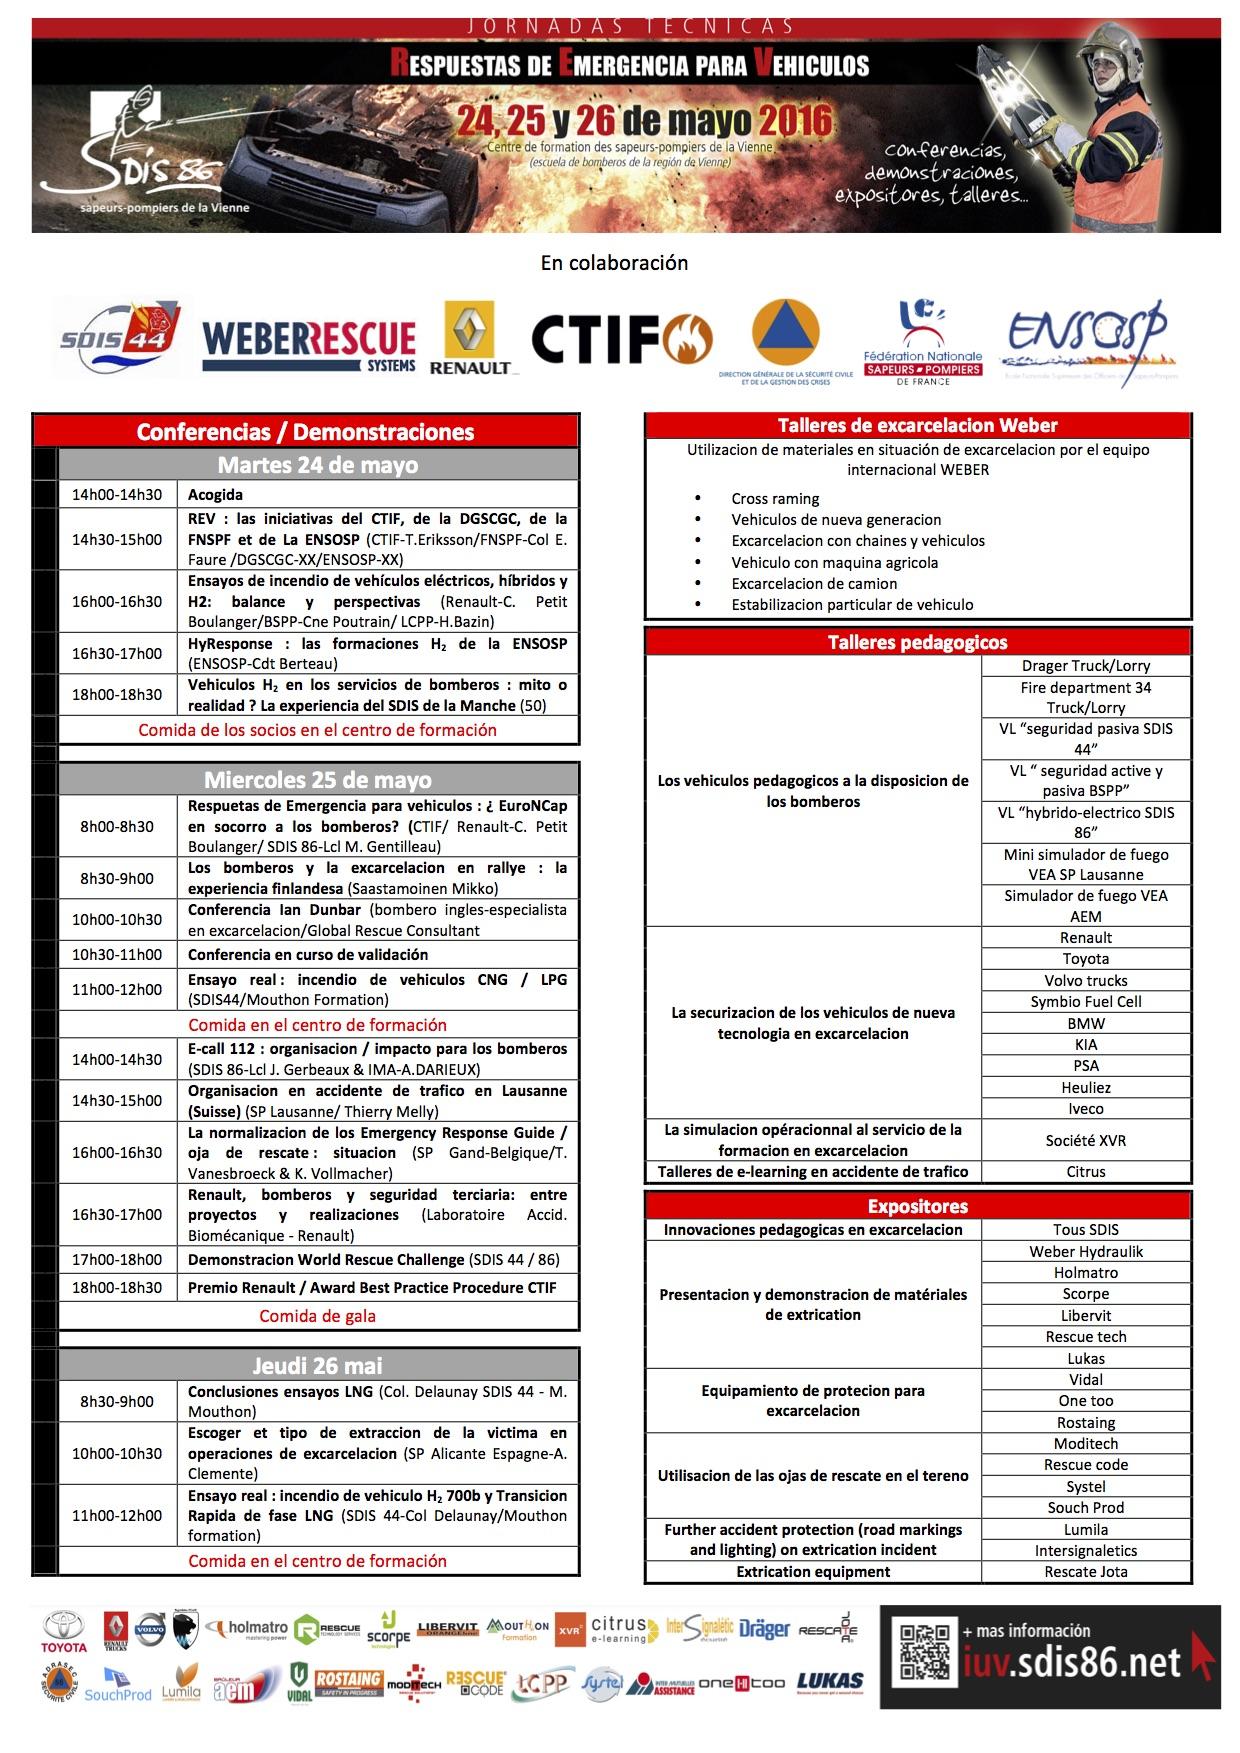 JT IUV 2016_ES_programme_v6_public